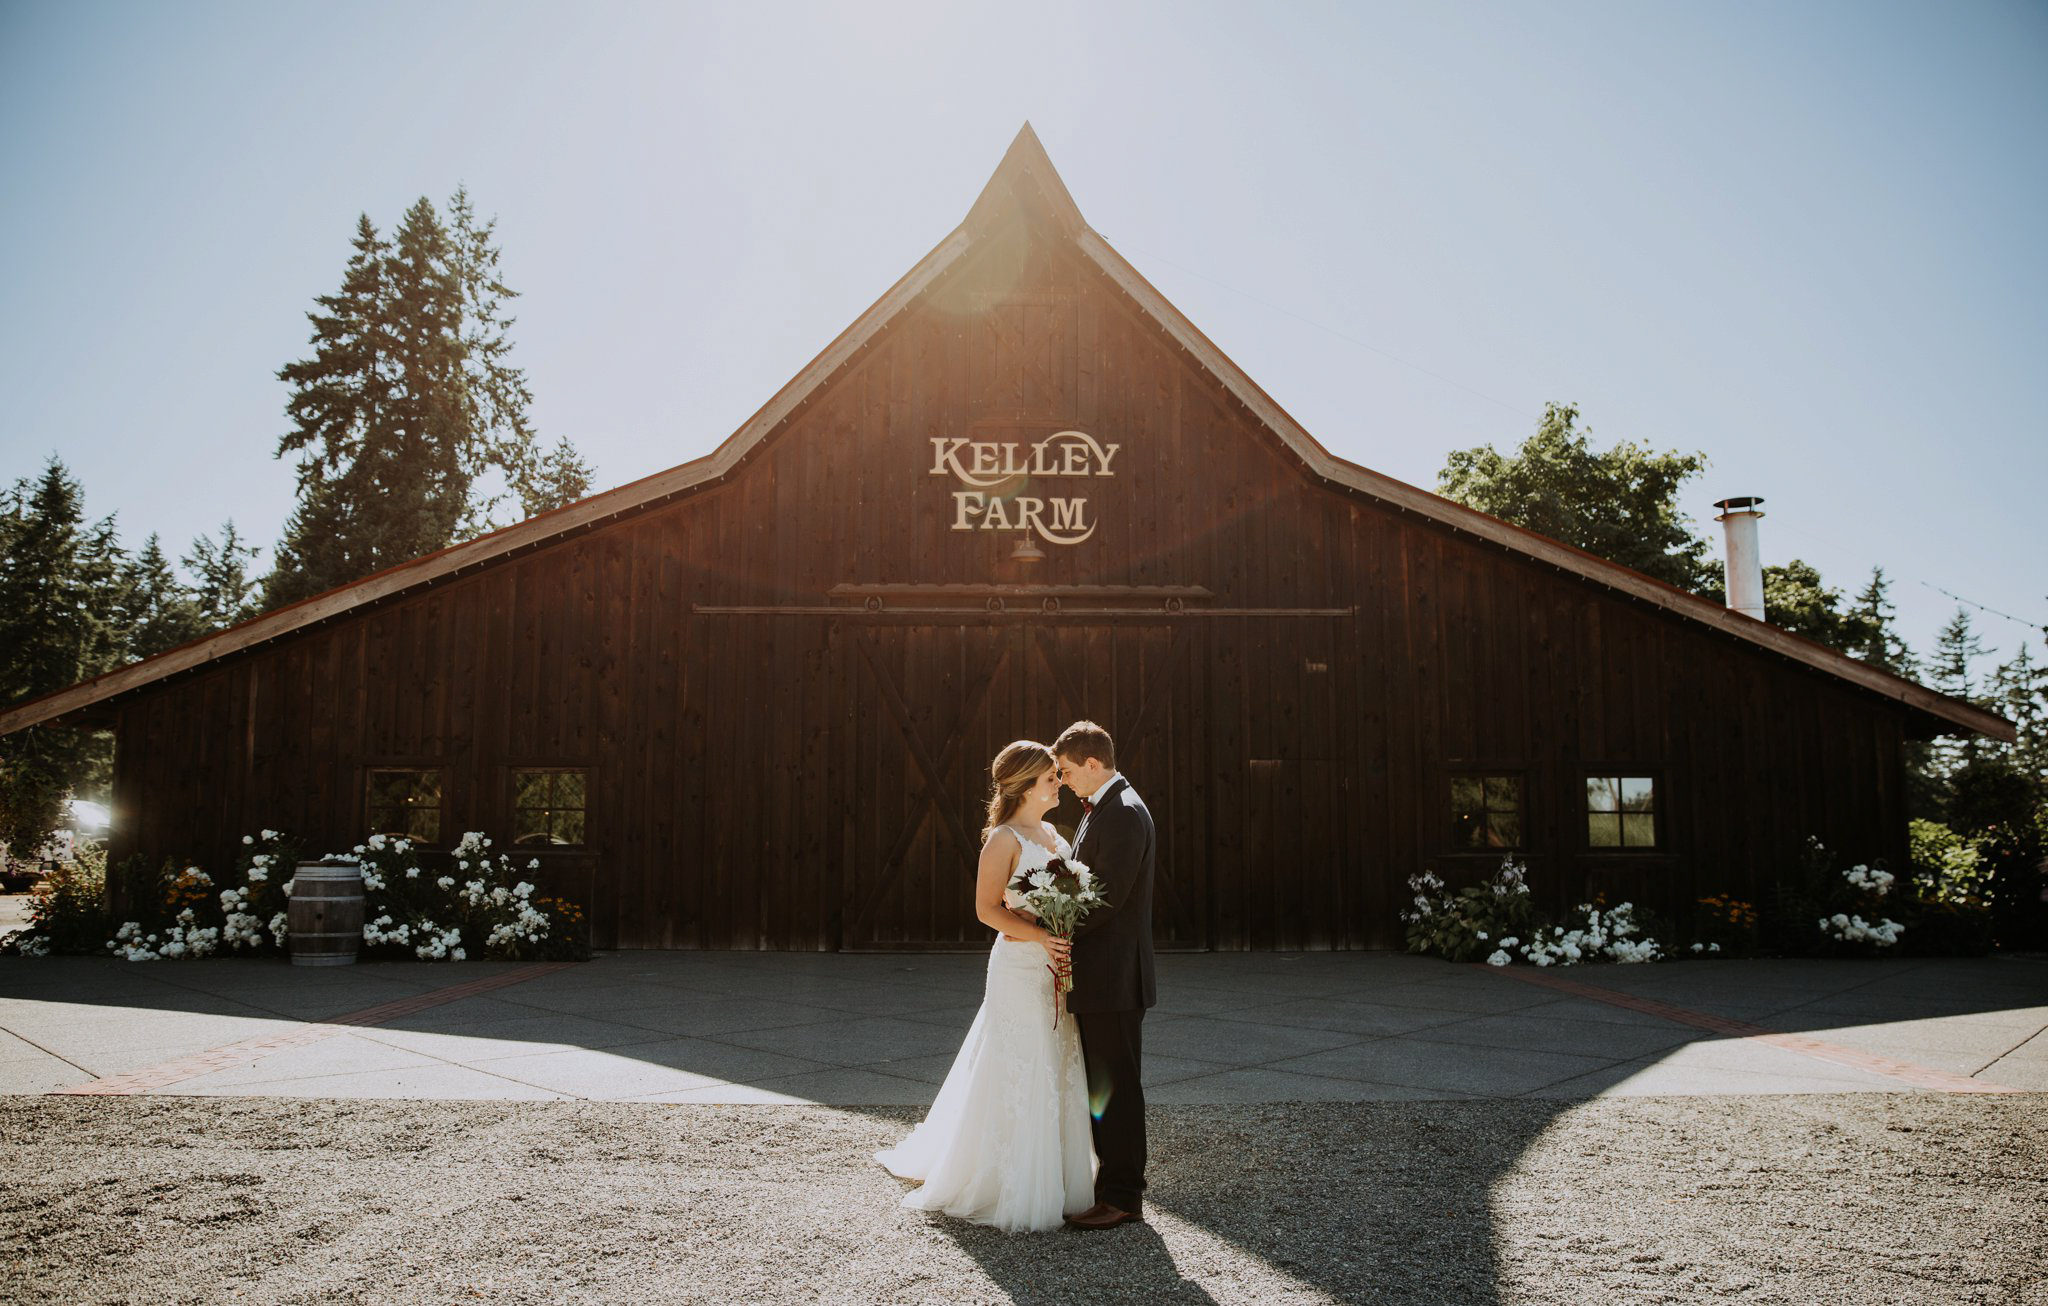 kristen-and-cody-the-kelley-farm-wedding-seattle-photographer-caitlyn-nikula-56.jpg